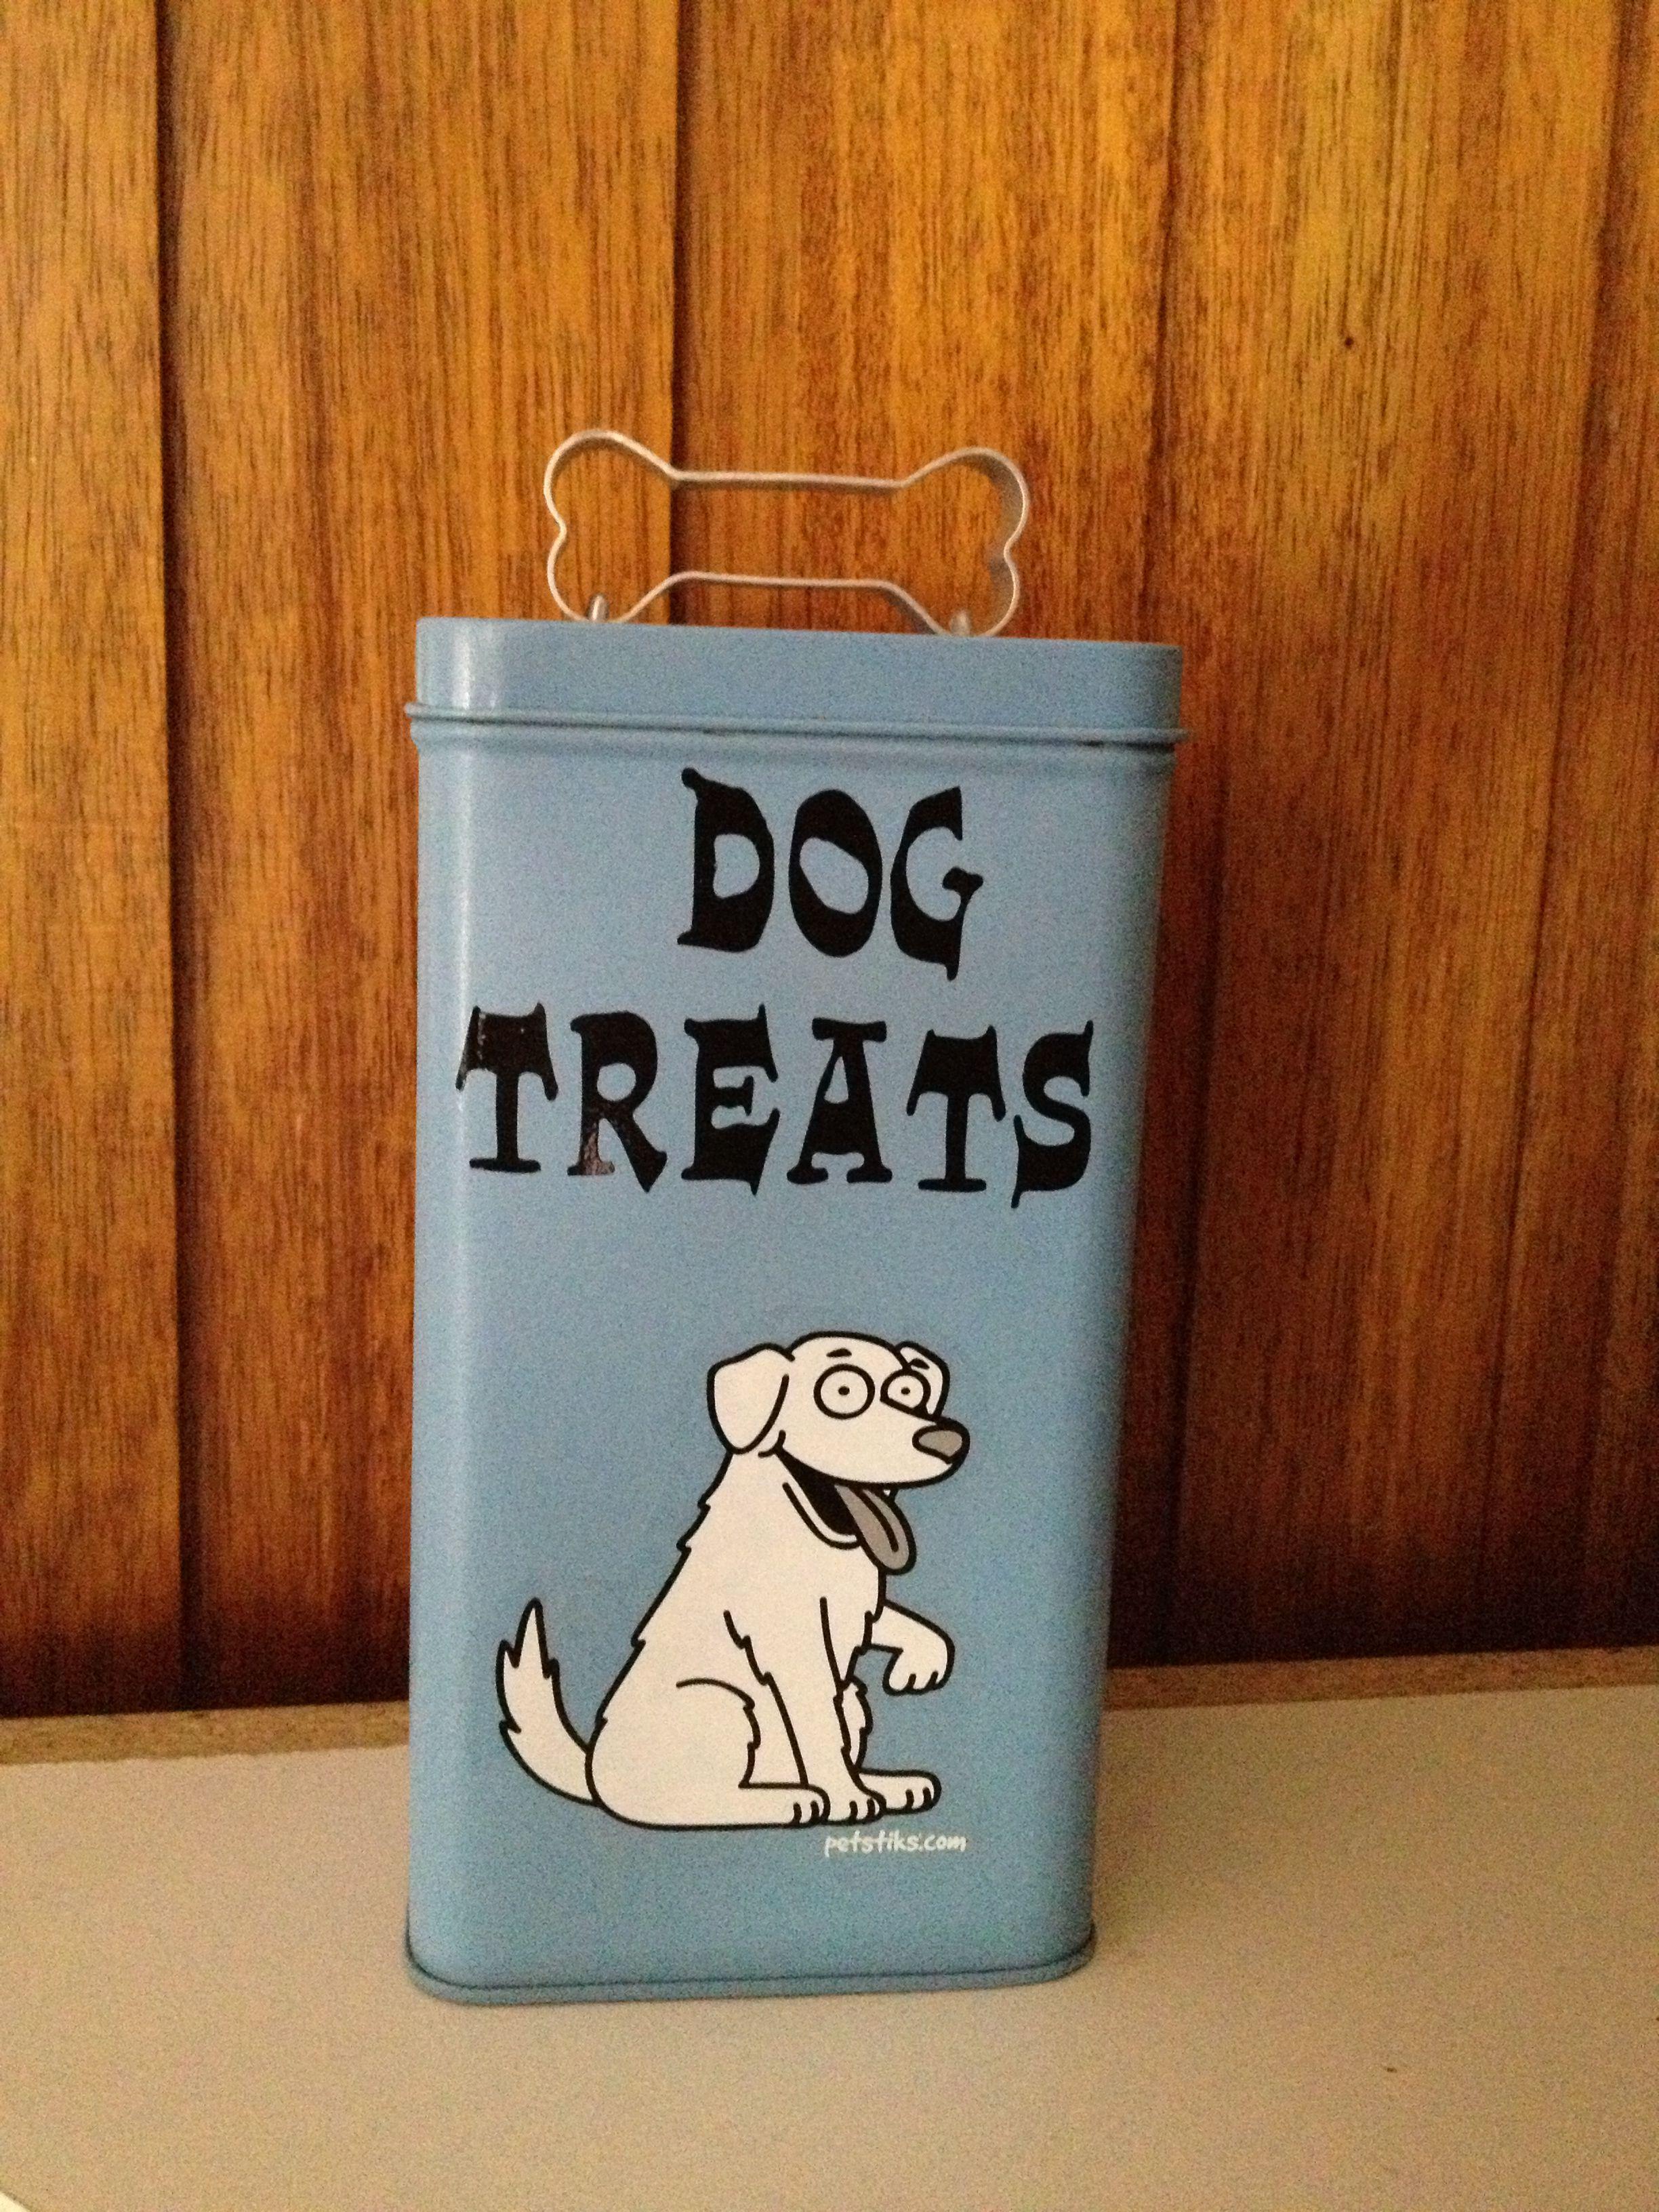 Diy Dog Treat Tin Spray Paint An Old Tin Add Vinyl Stickers And A Bone Shaped Cookie Cutter For A Handle Diy Dog Treats Diy Stuffed Animals Diy Dog Stuff